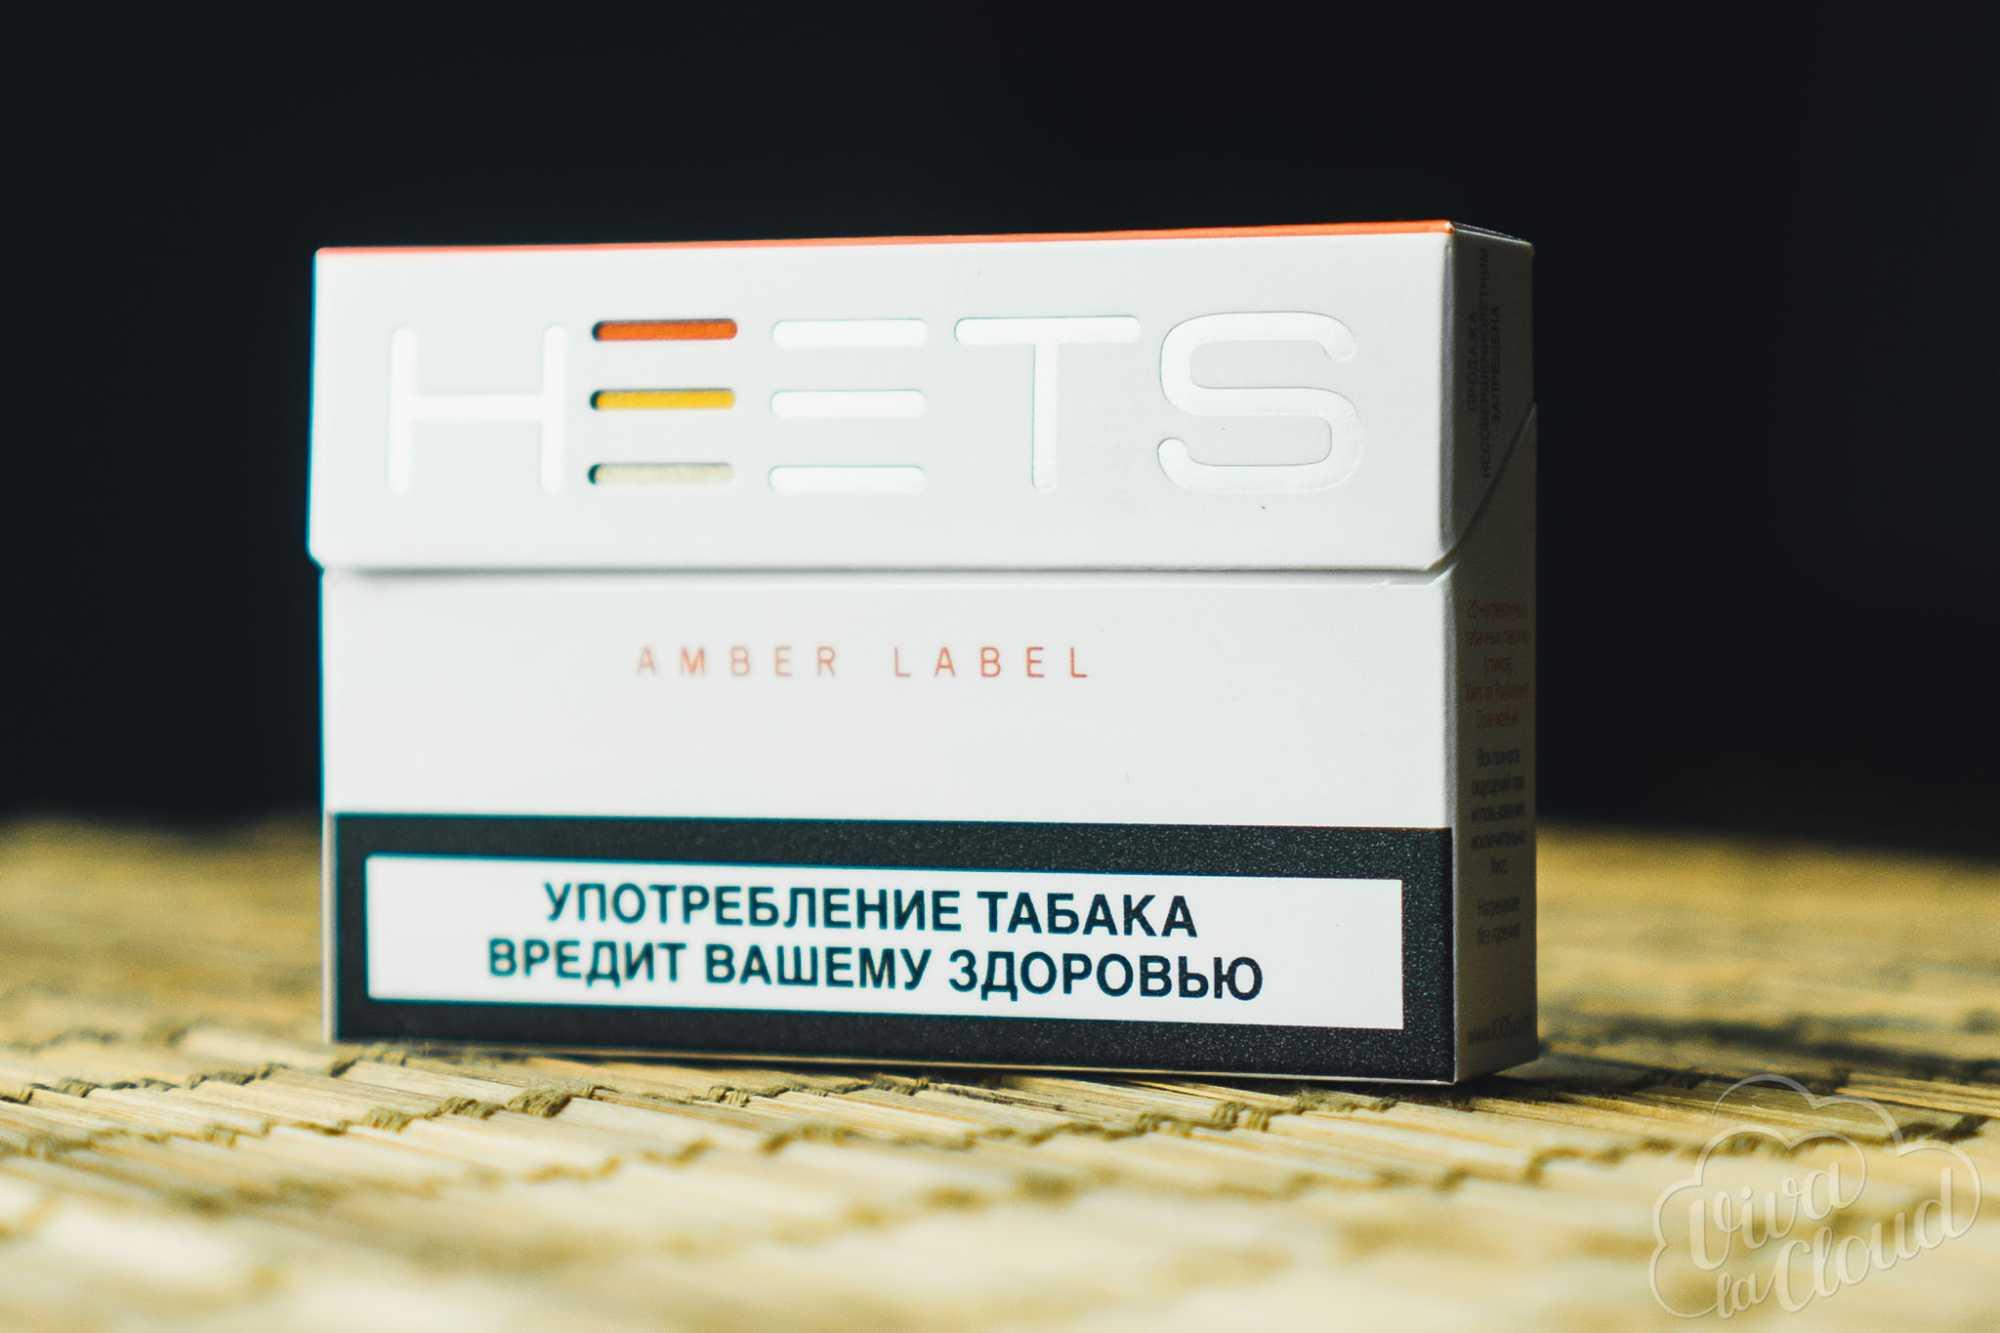 Cтики Iqos Heets Amber Label